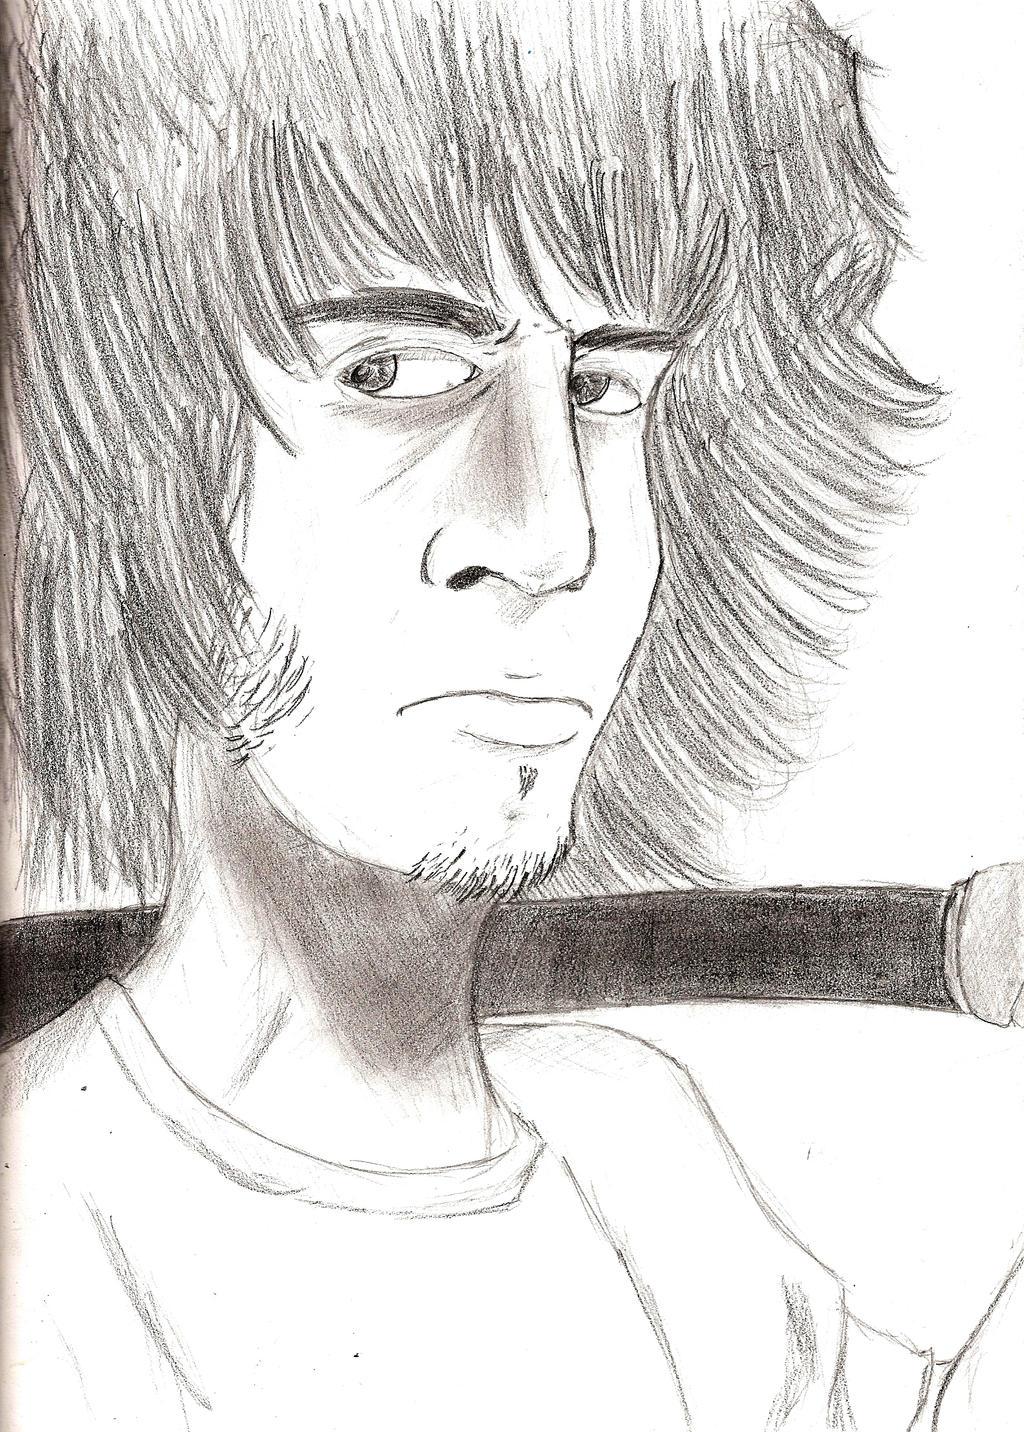 Self Portrait 'horrible'